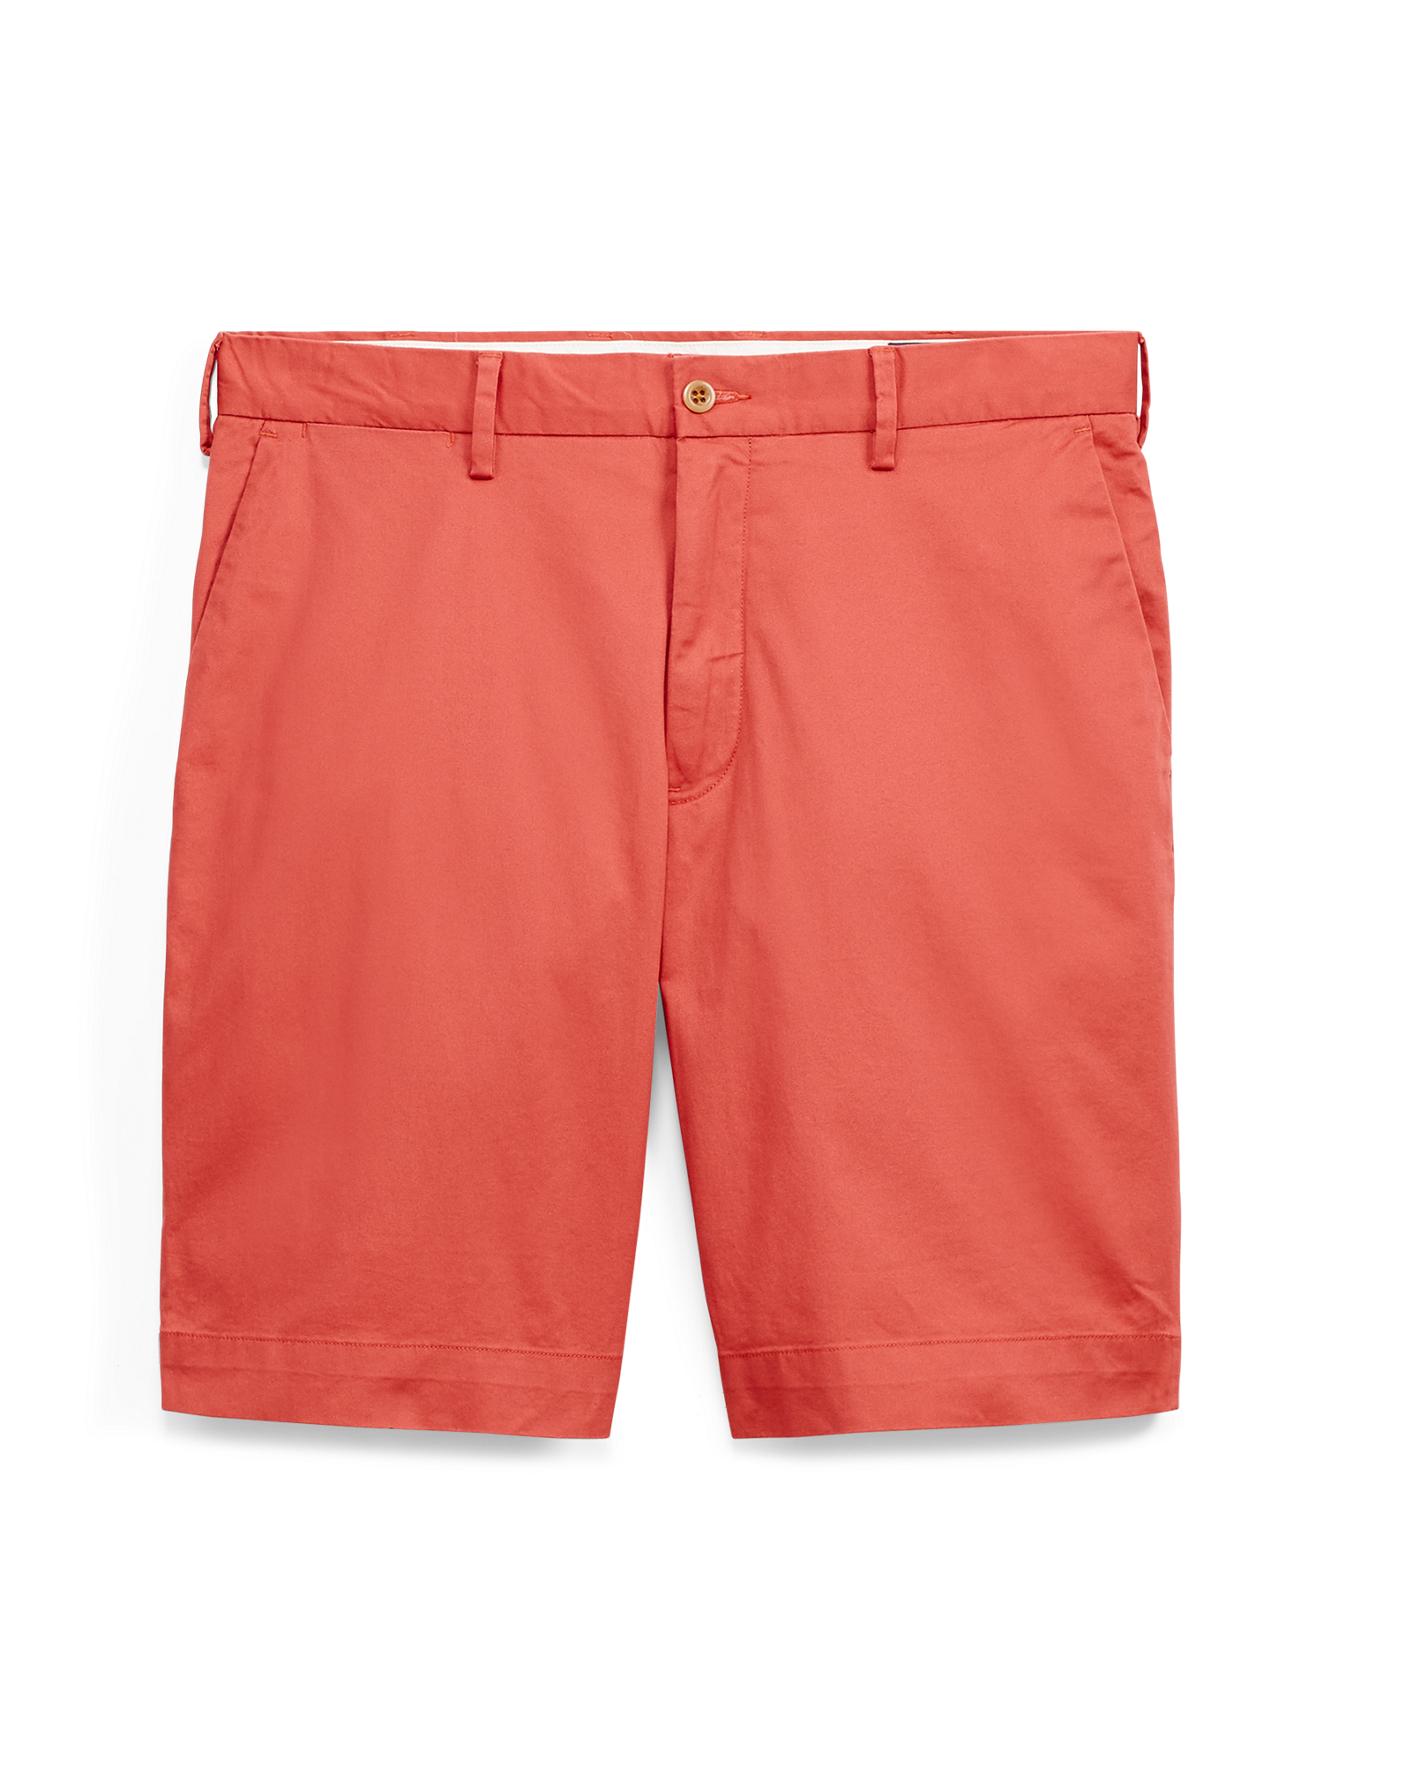 Men's Shorts Sale - Chino, Khaki, Fleece | Ralph Lauren